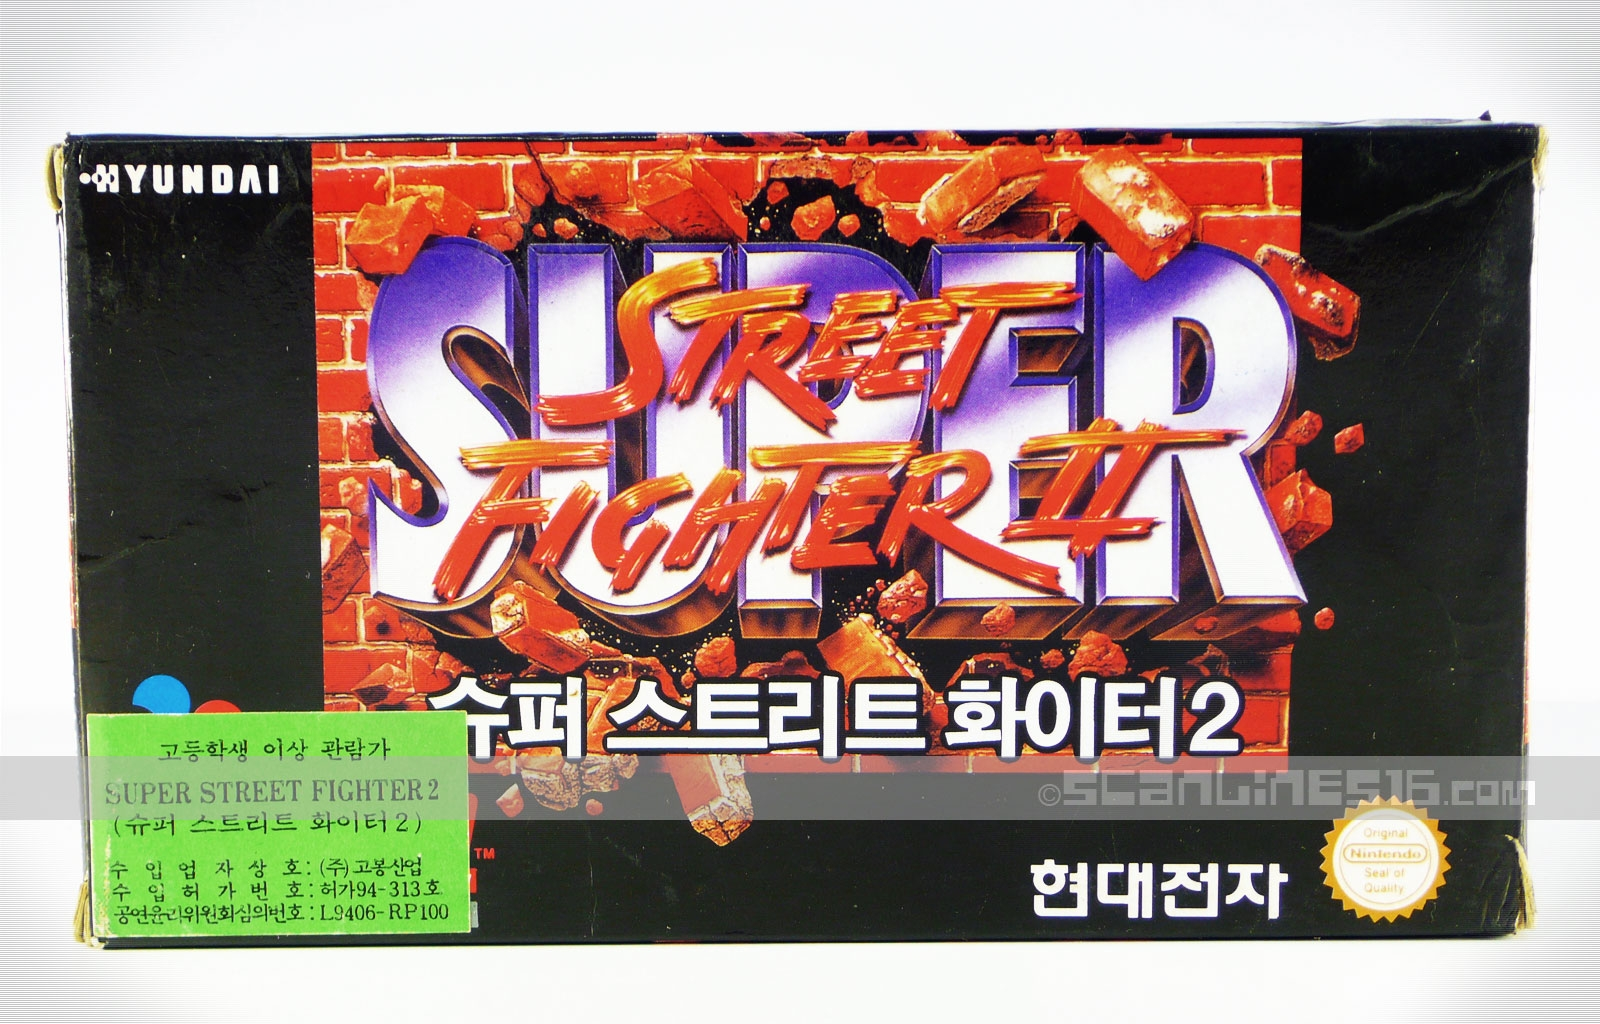 superstreetfighterII_01_1600